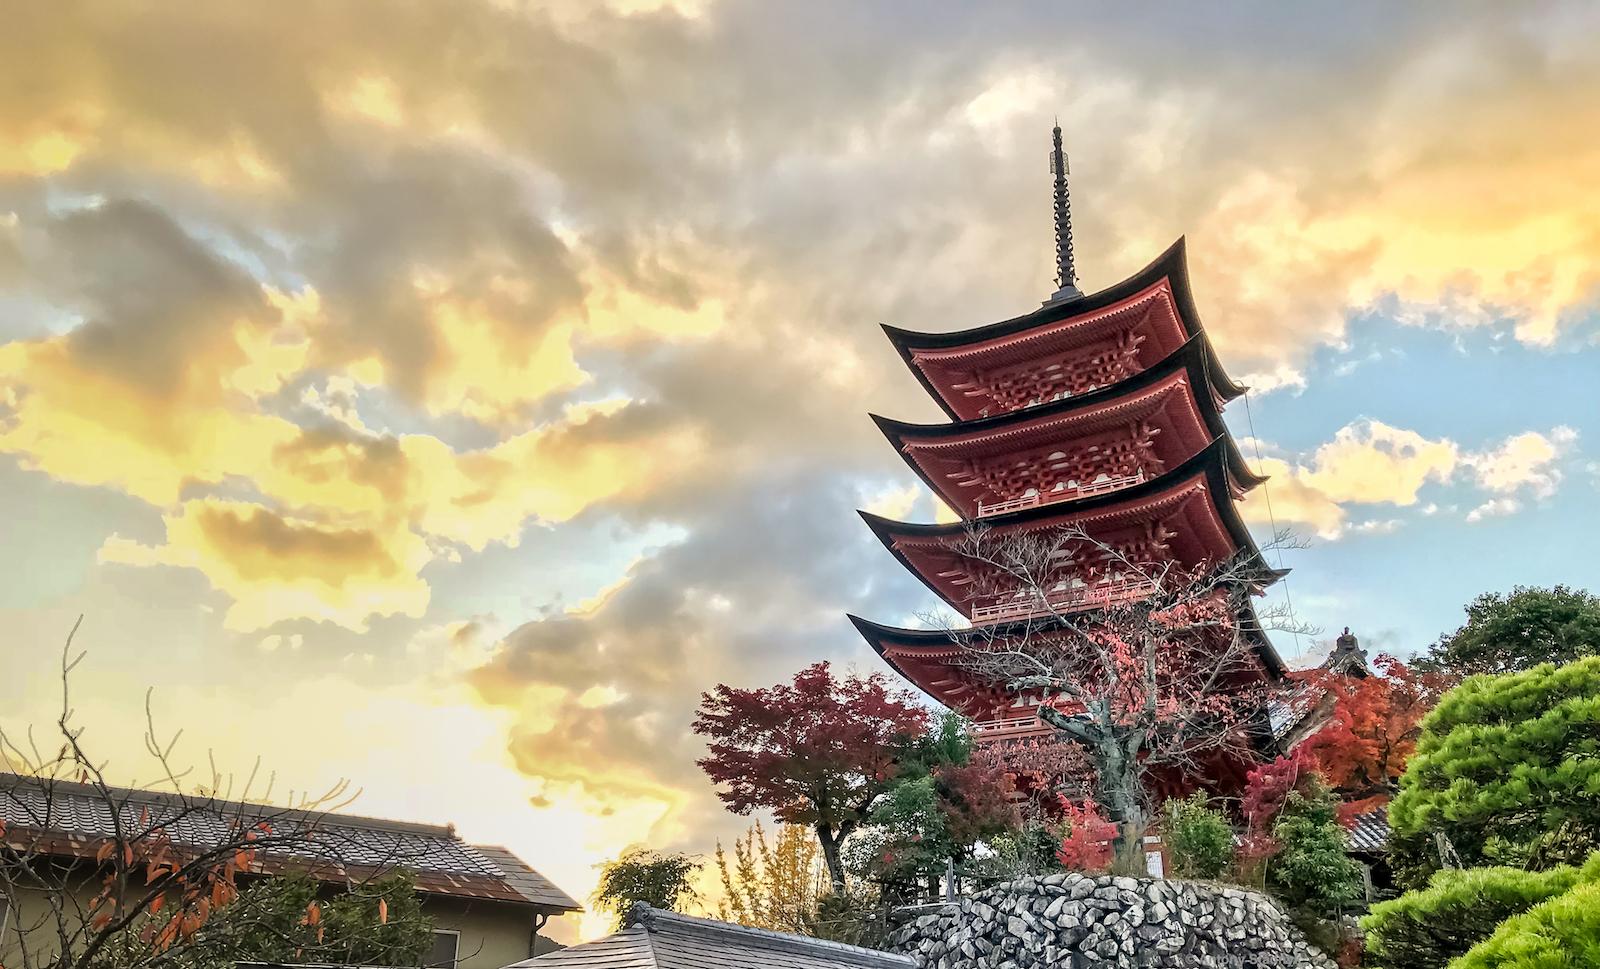 Miyajima - Five-storey Pagoda, Japan